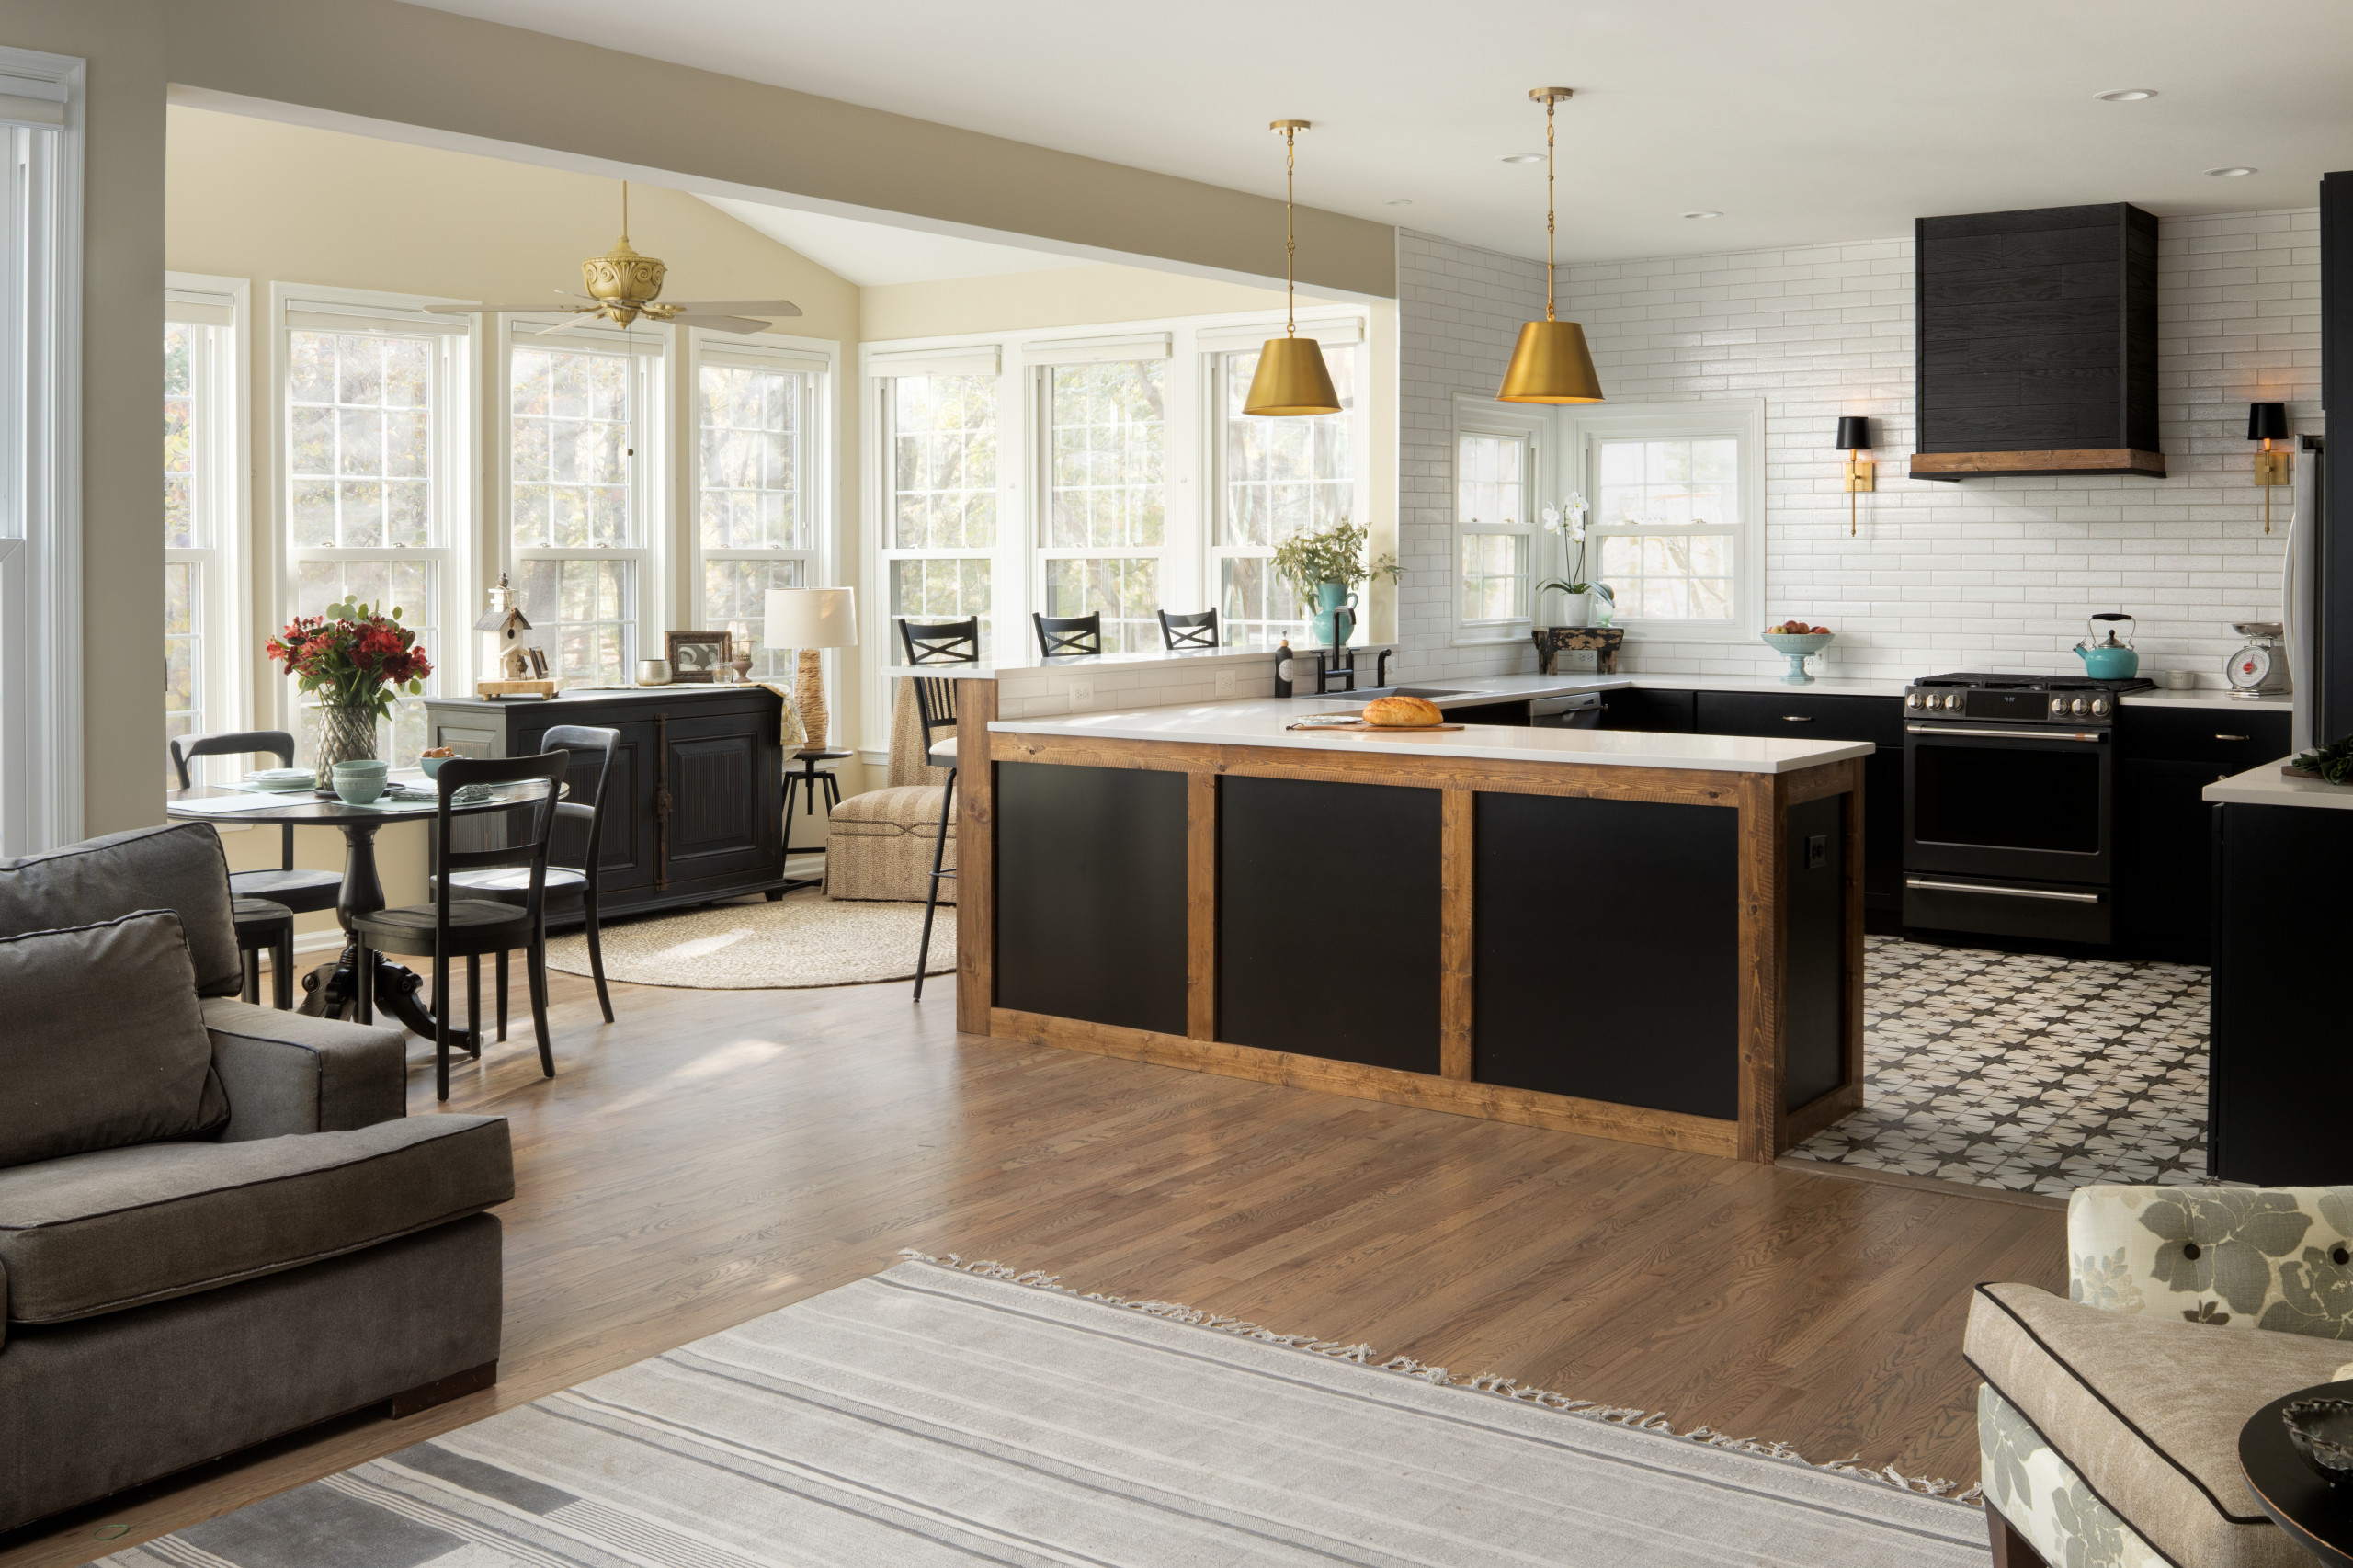 Odd Shaped Rooms Kitchen Ideas Photos Houzz